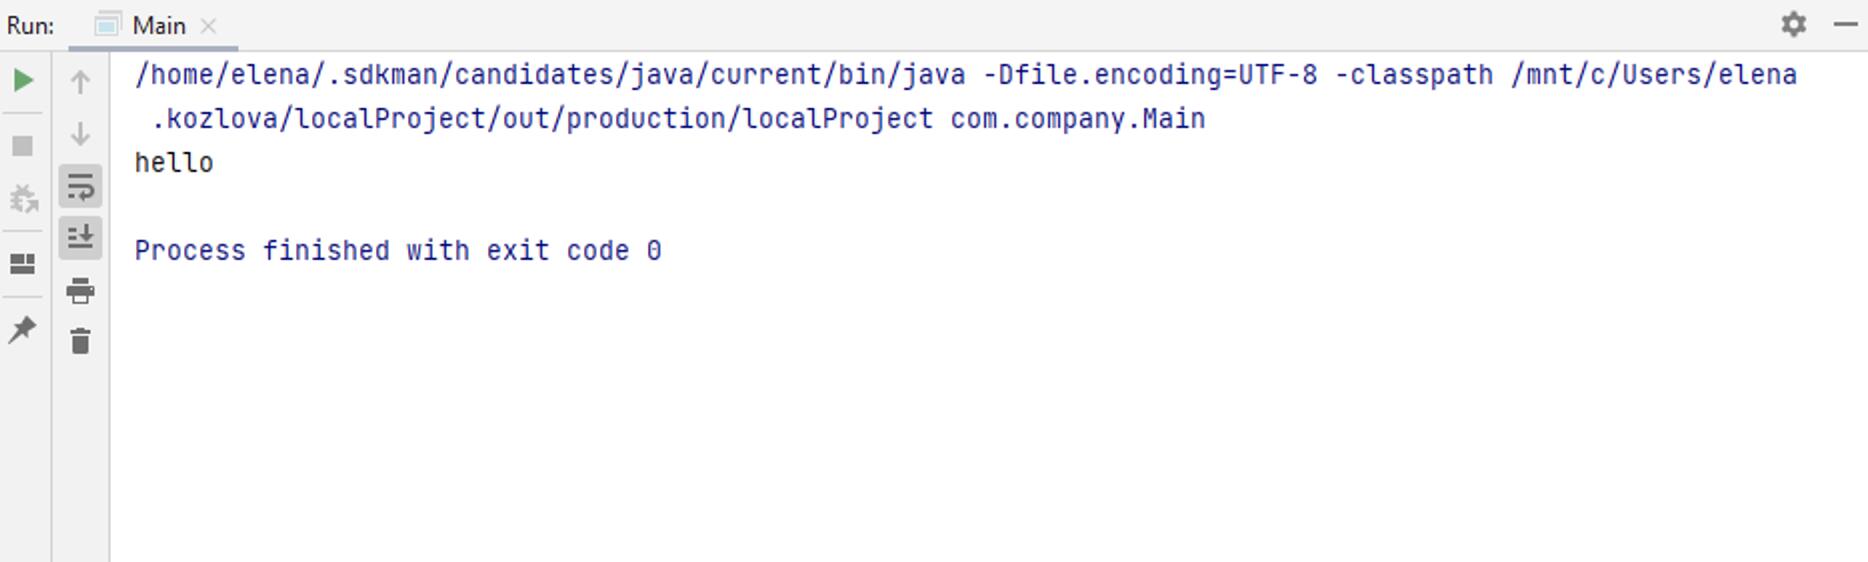 Run tool window: WSL output